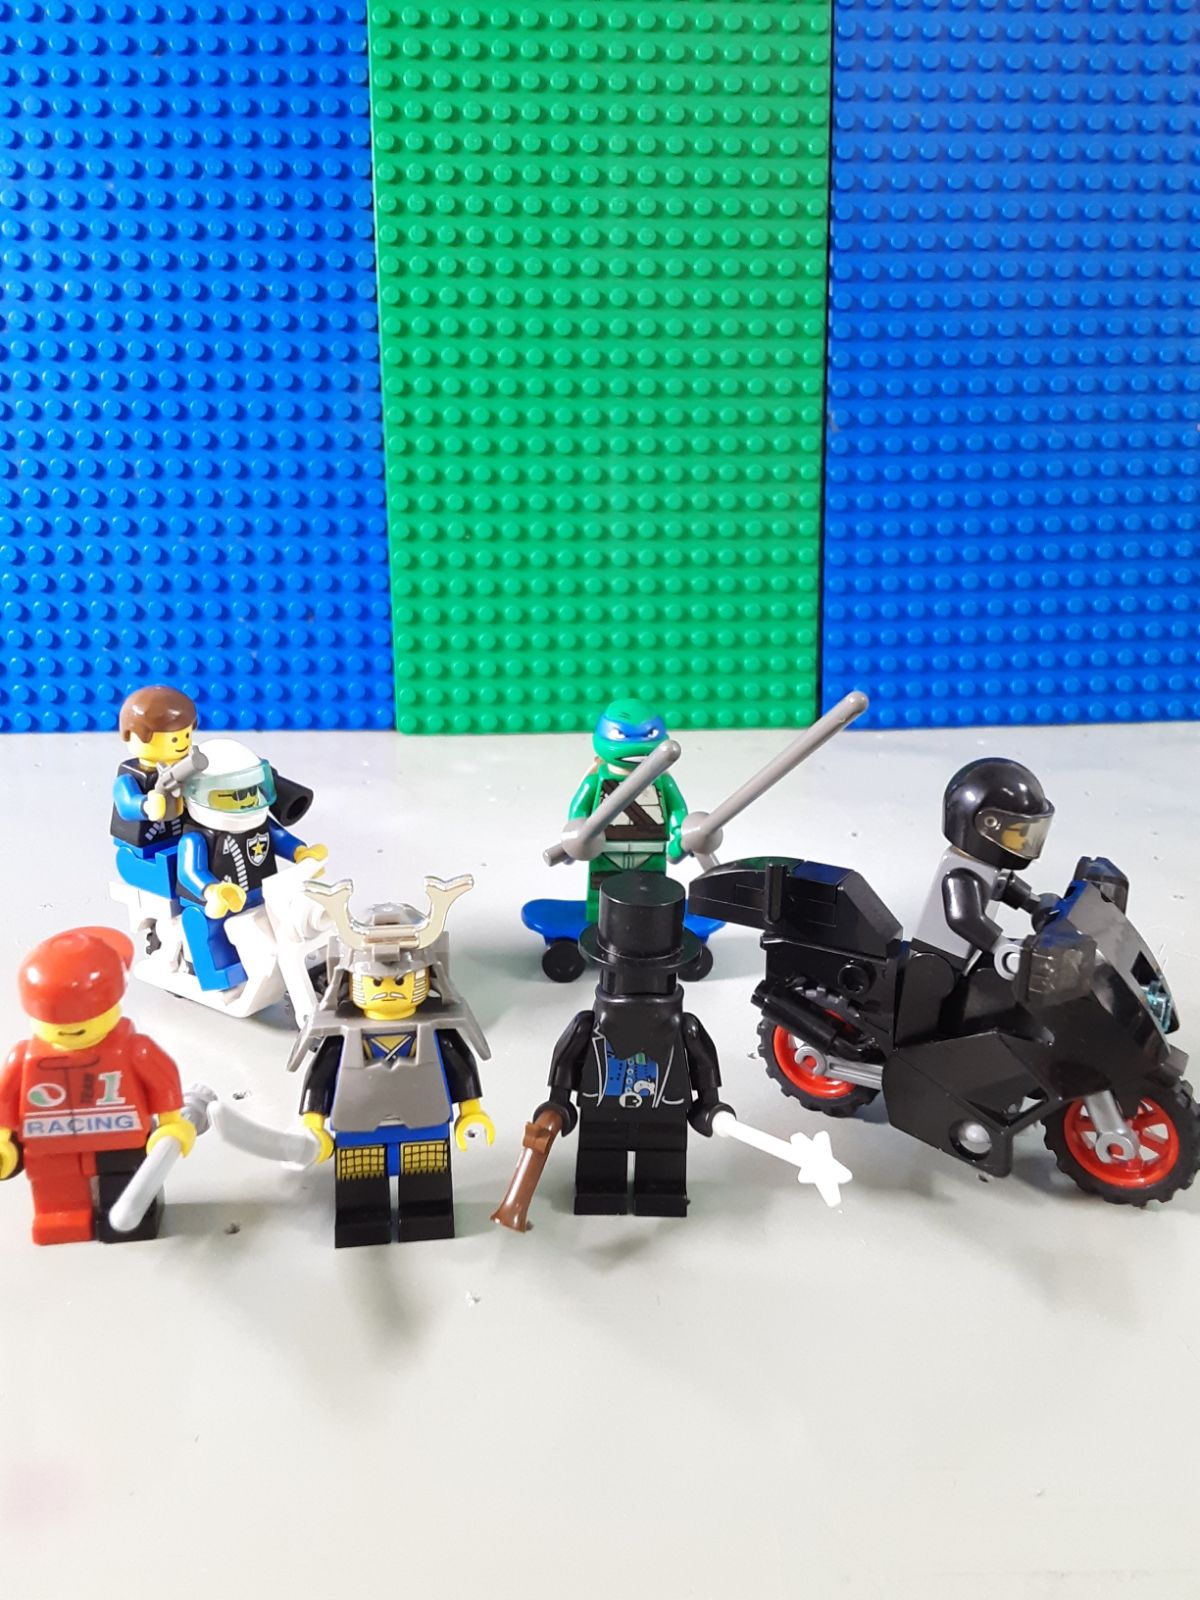 LEGO Minifigures: 1